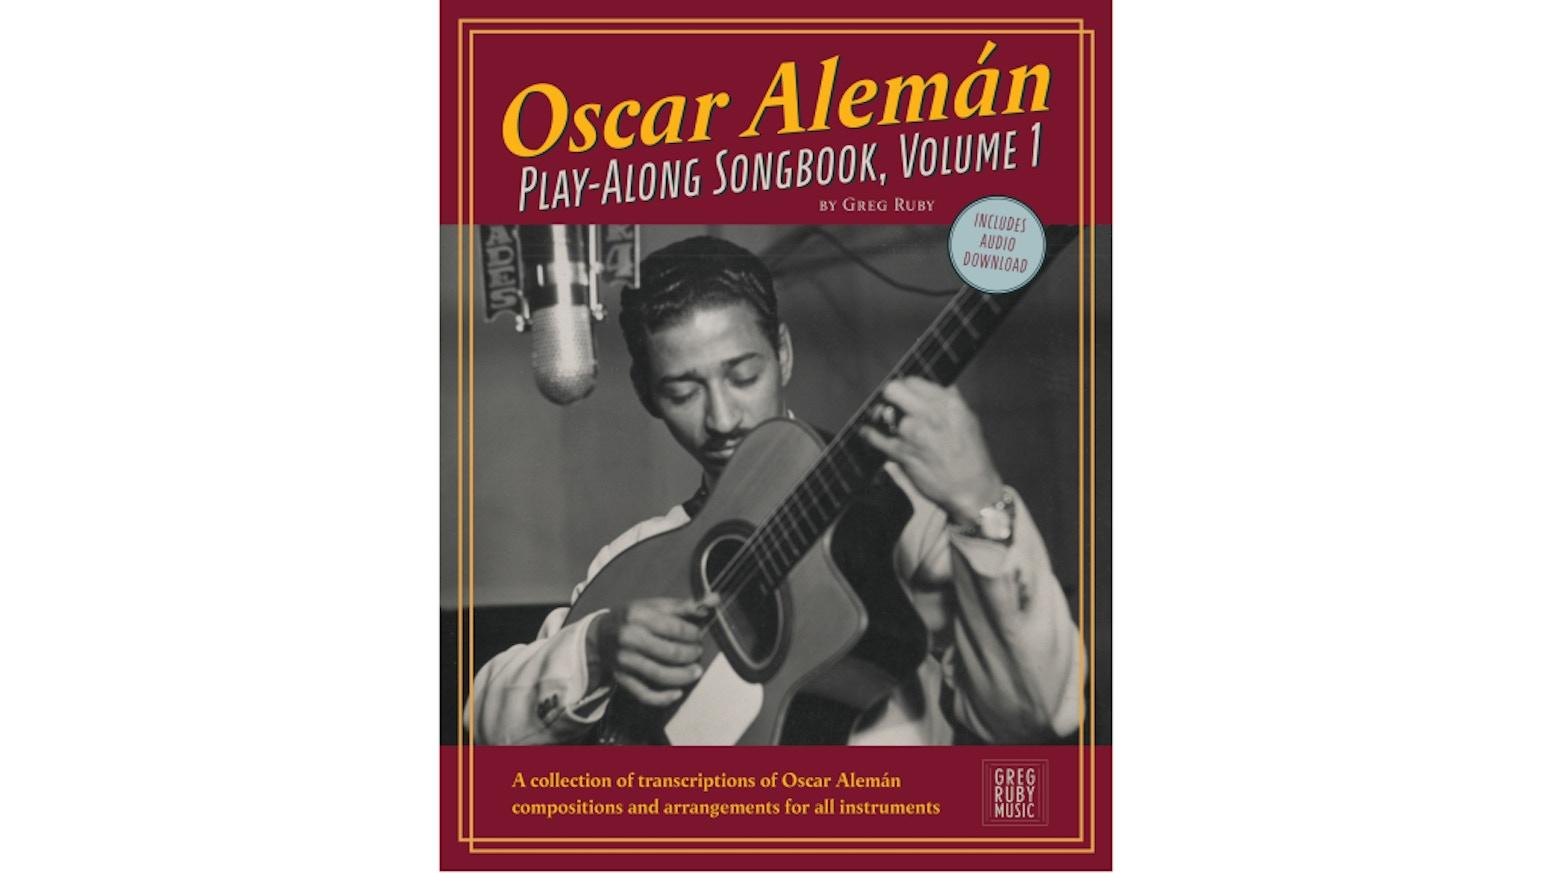 The Oscar Alemán Play-Along Book by Greg Ruby — Kickstarter